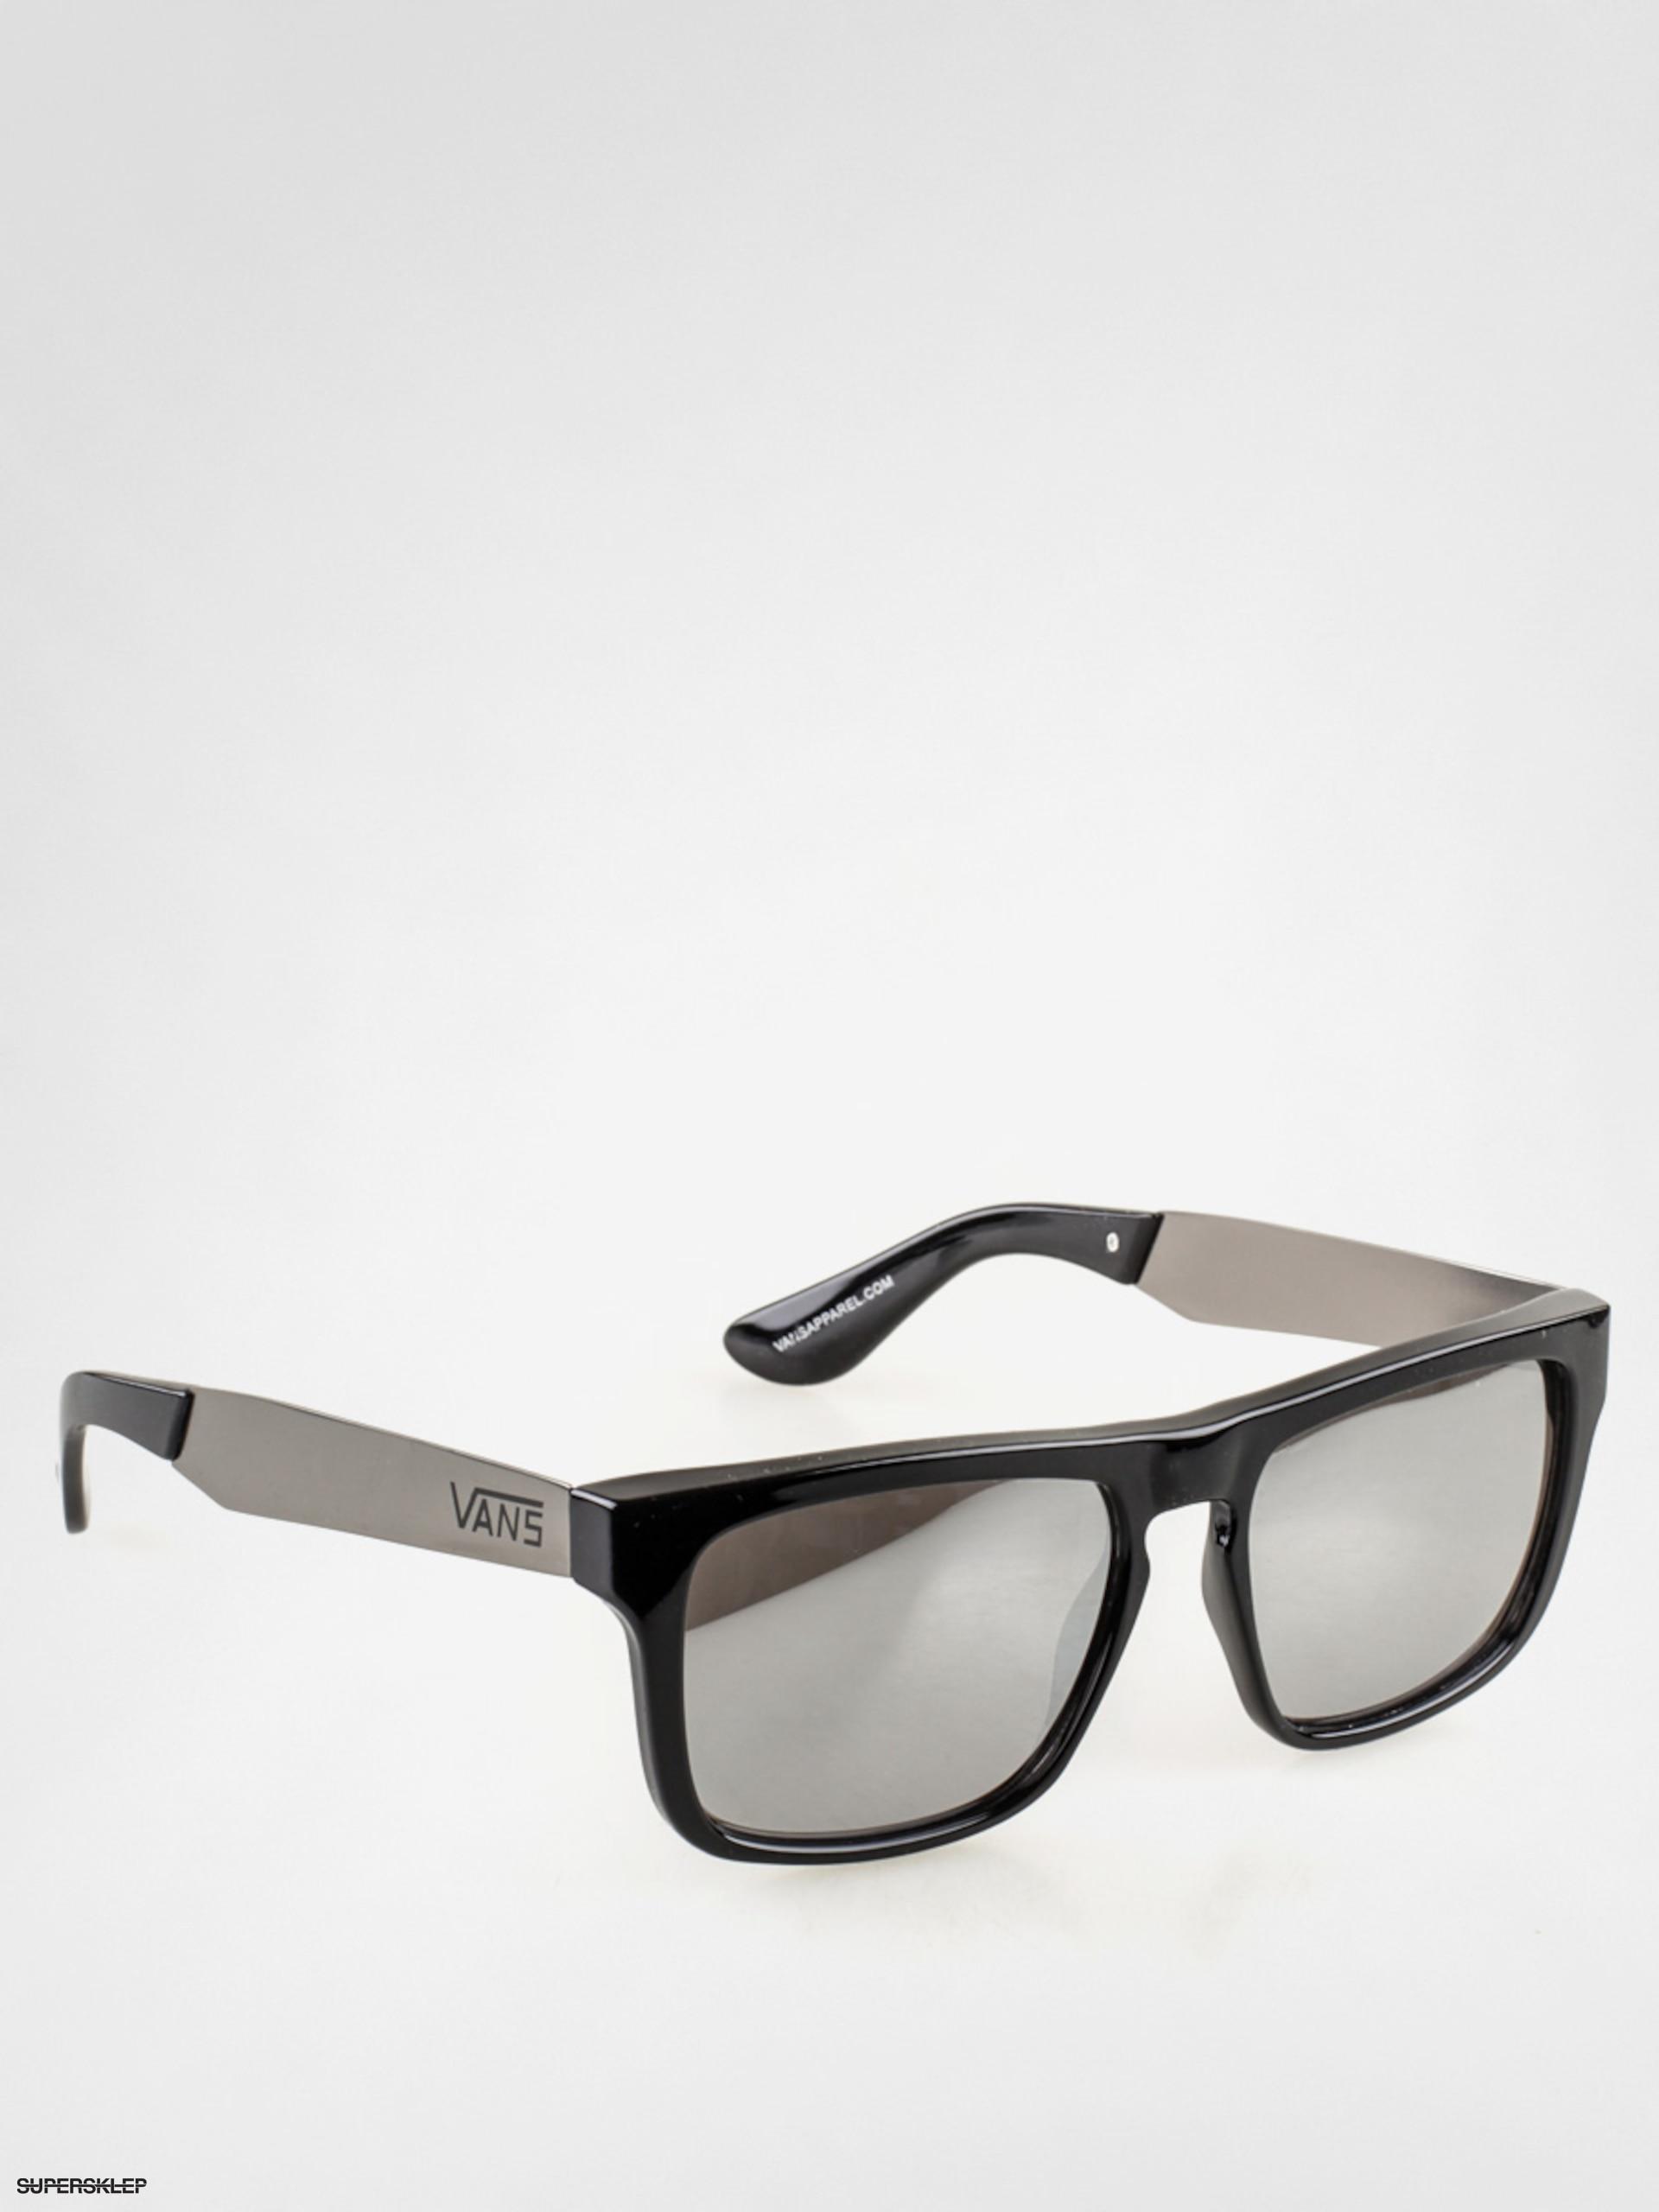 Slnečné okuliare Vans Squared Off (black silver) 82b64c4532a